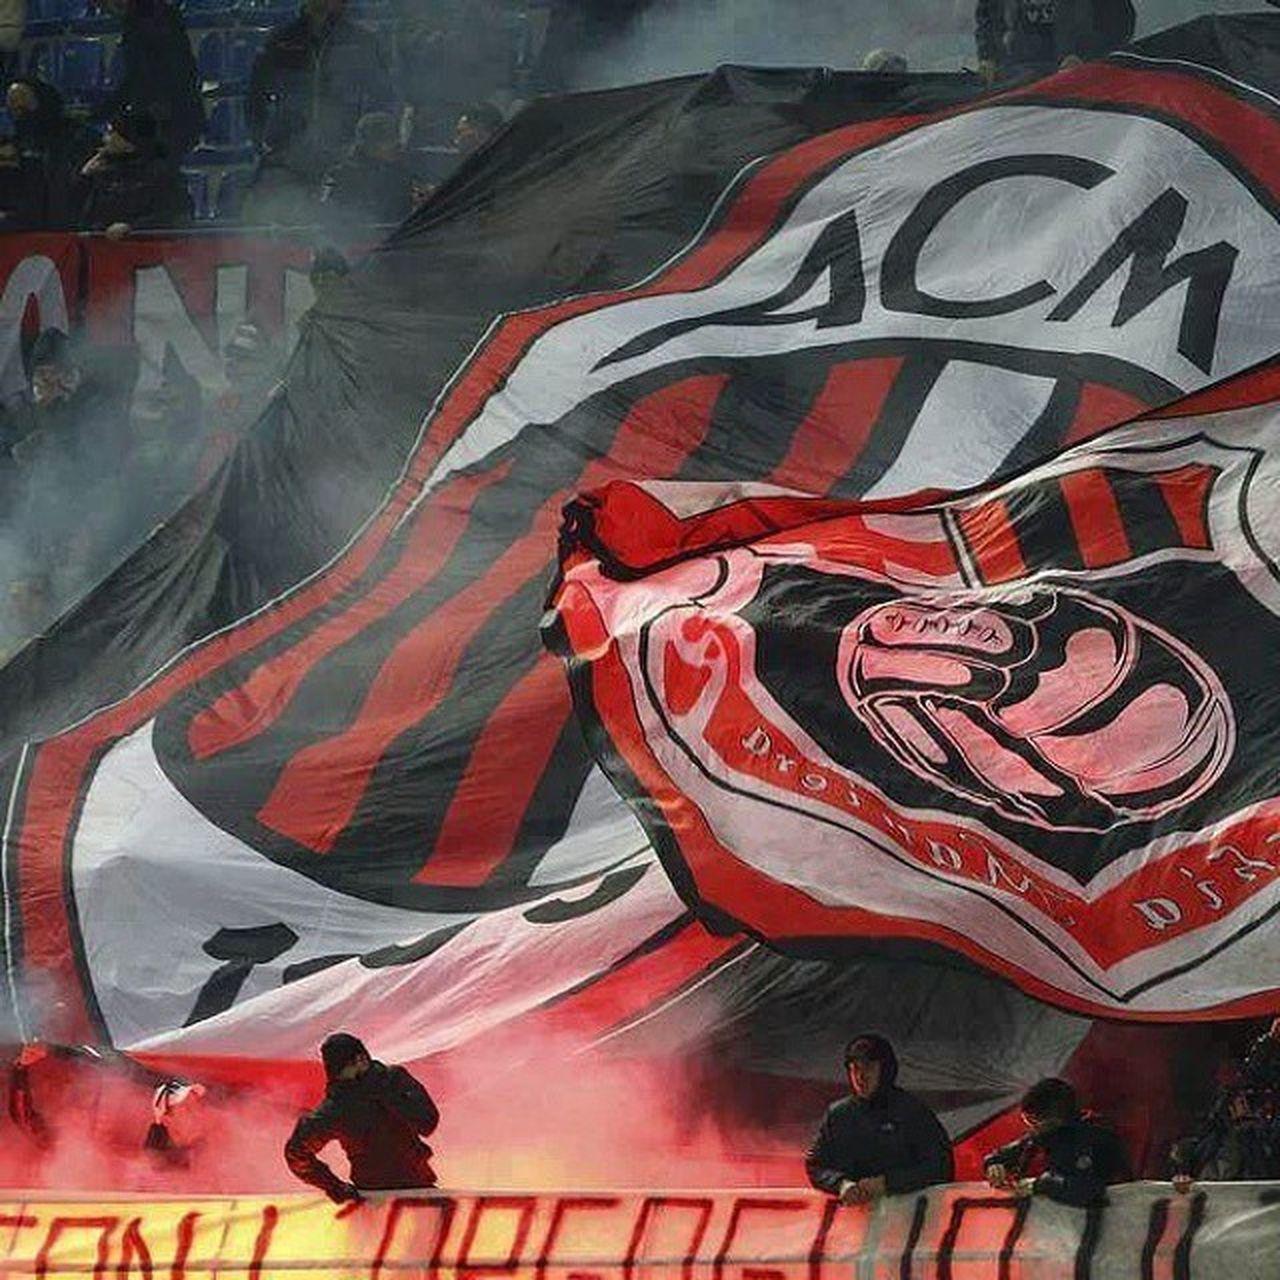 Anniversary Ac Milan 115 years old Buoncompleanno no glory no visca Forzamilan Forzaragazzi MilanistiIndonesian satu milanisti. ProudMilan